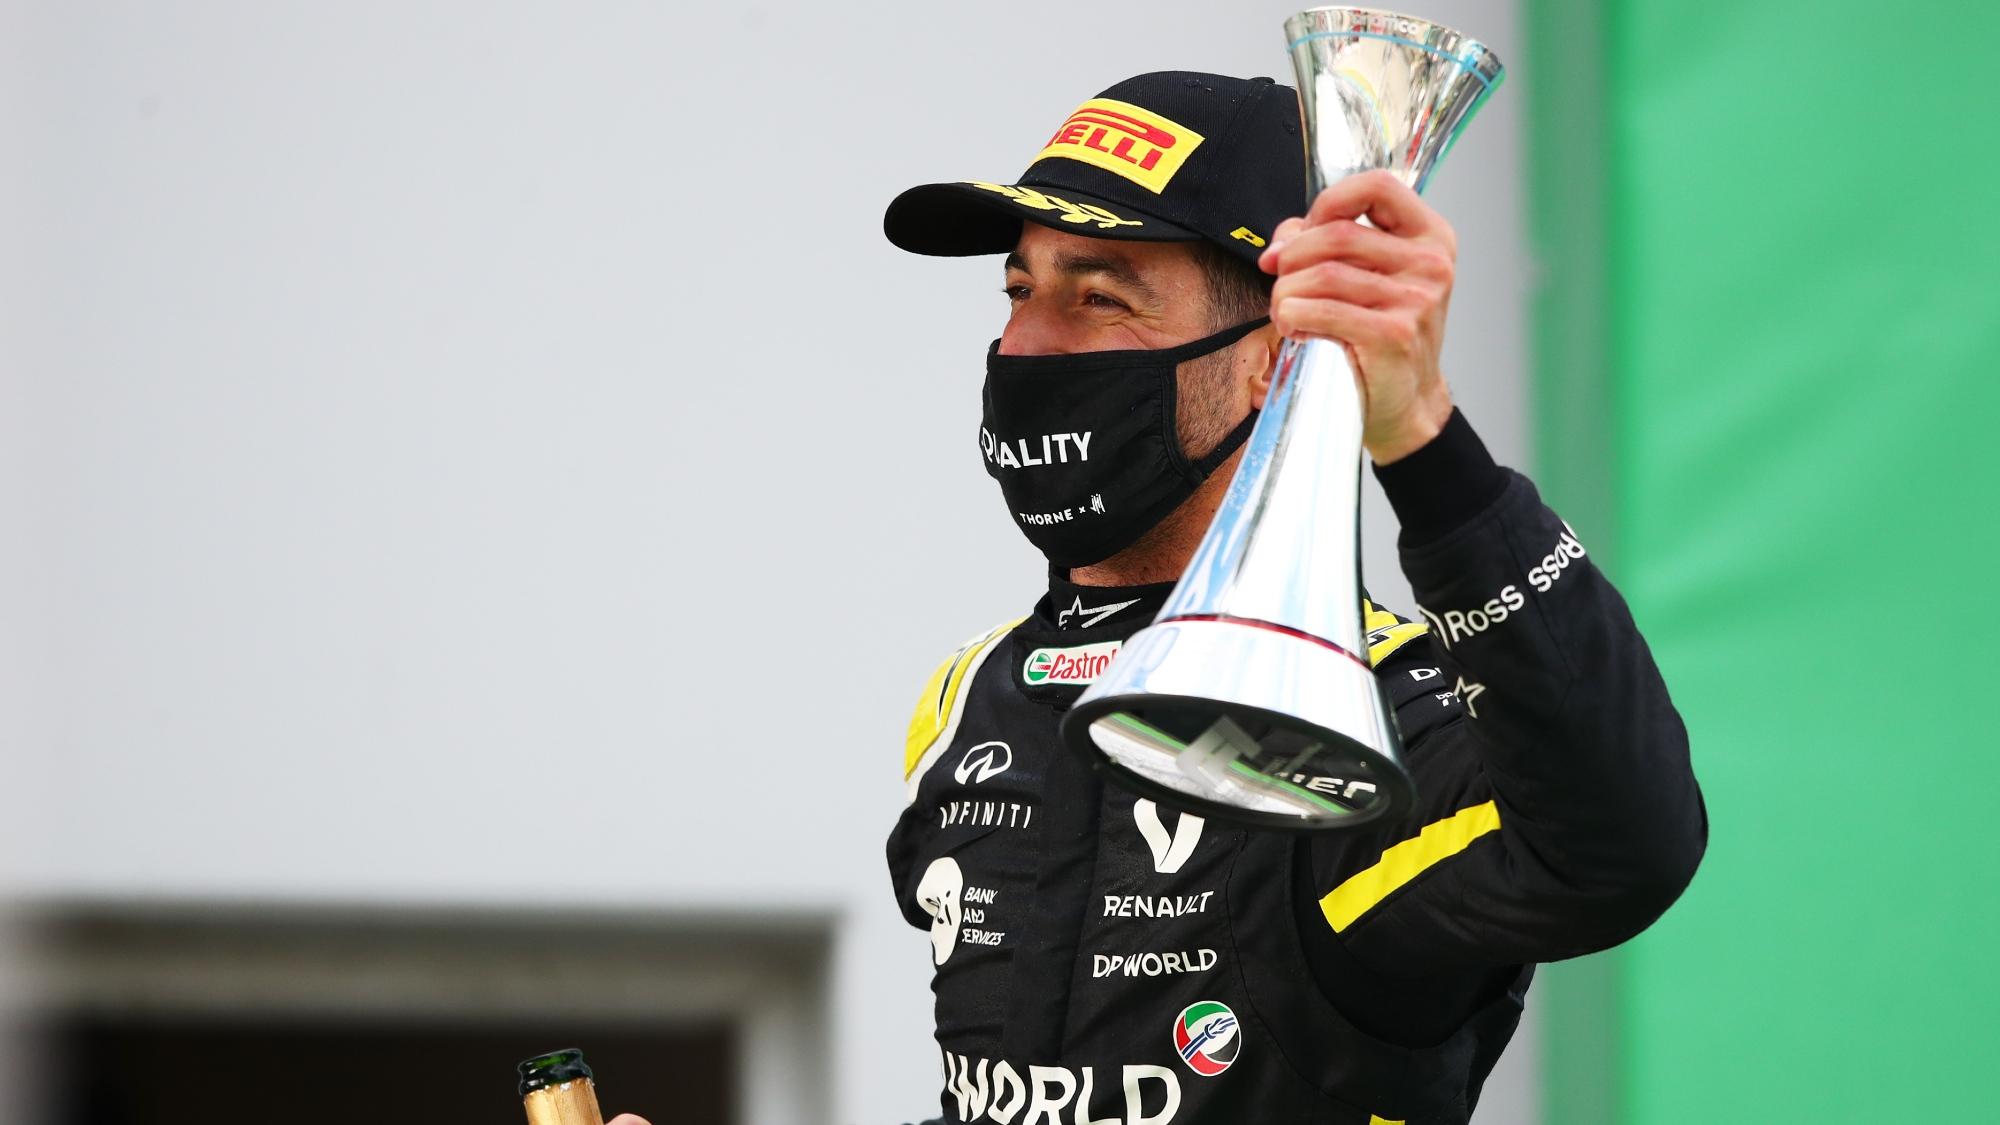 Daniel Ricciardo, 2020 Eifel GP